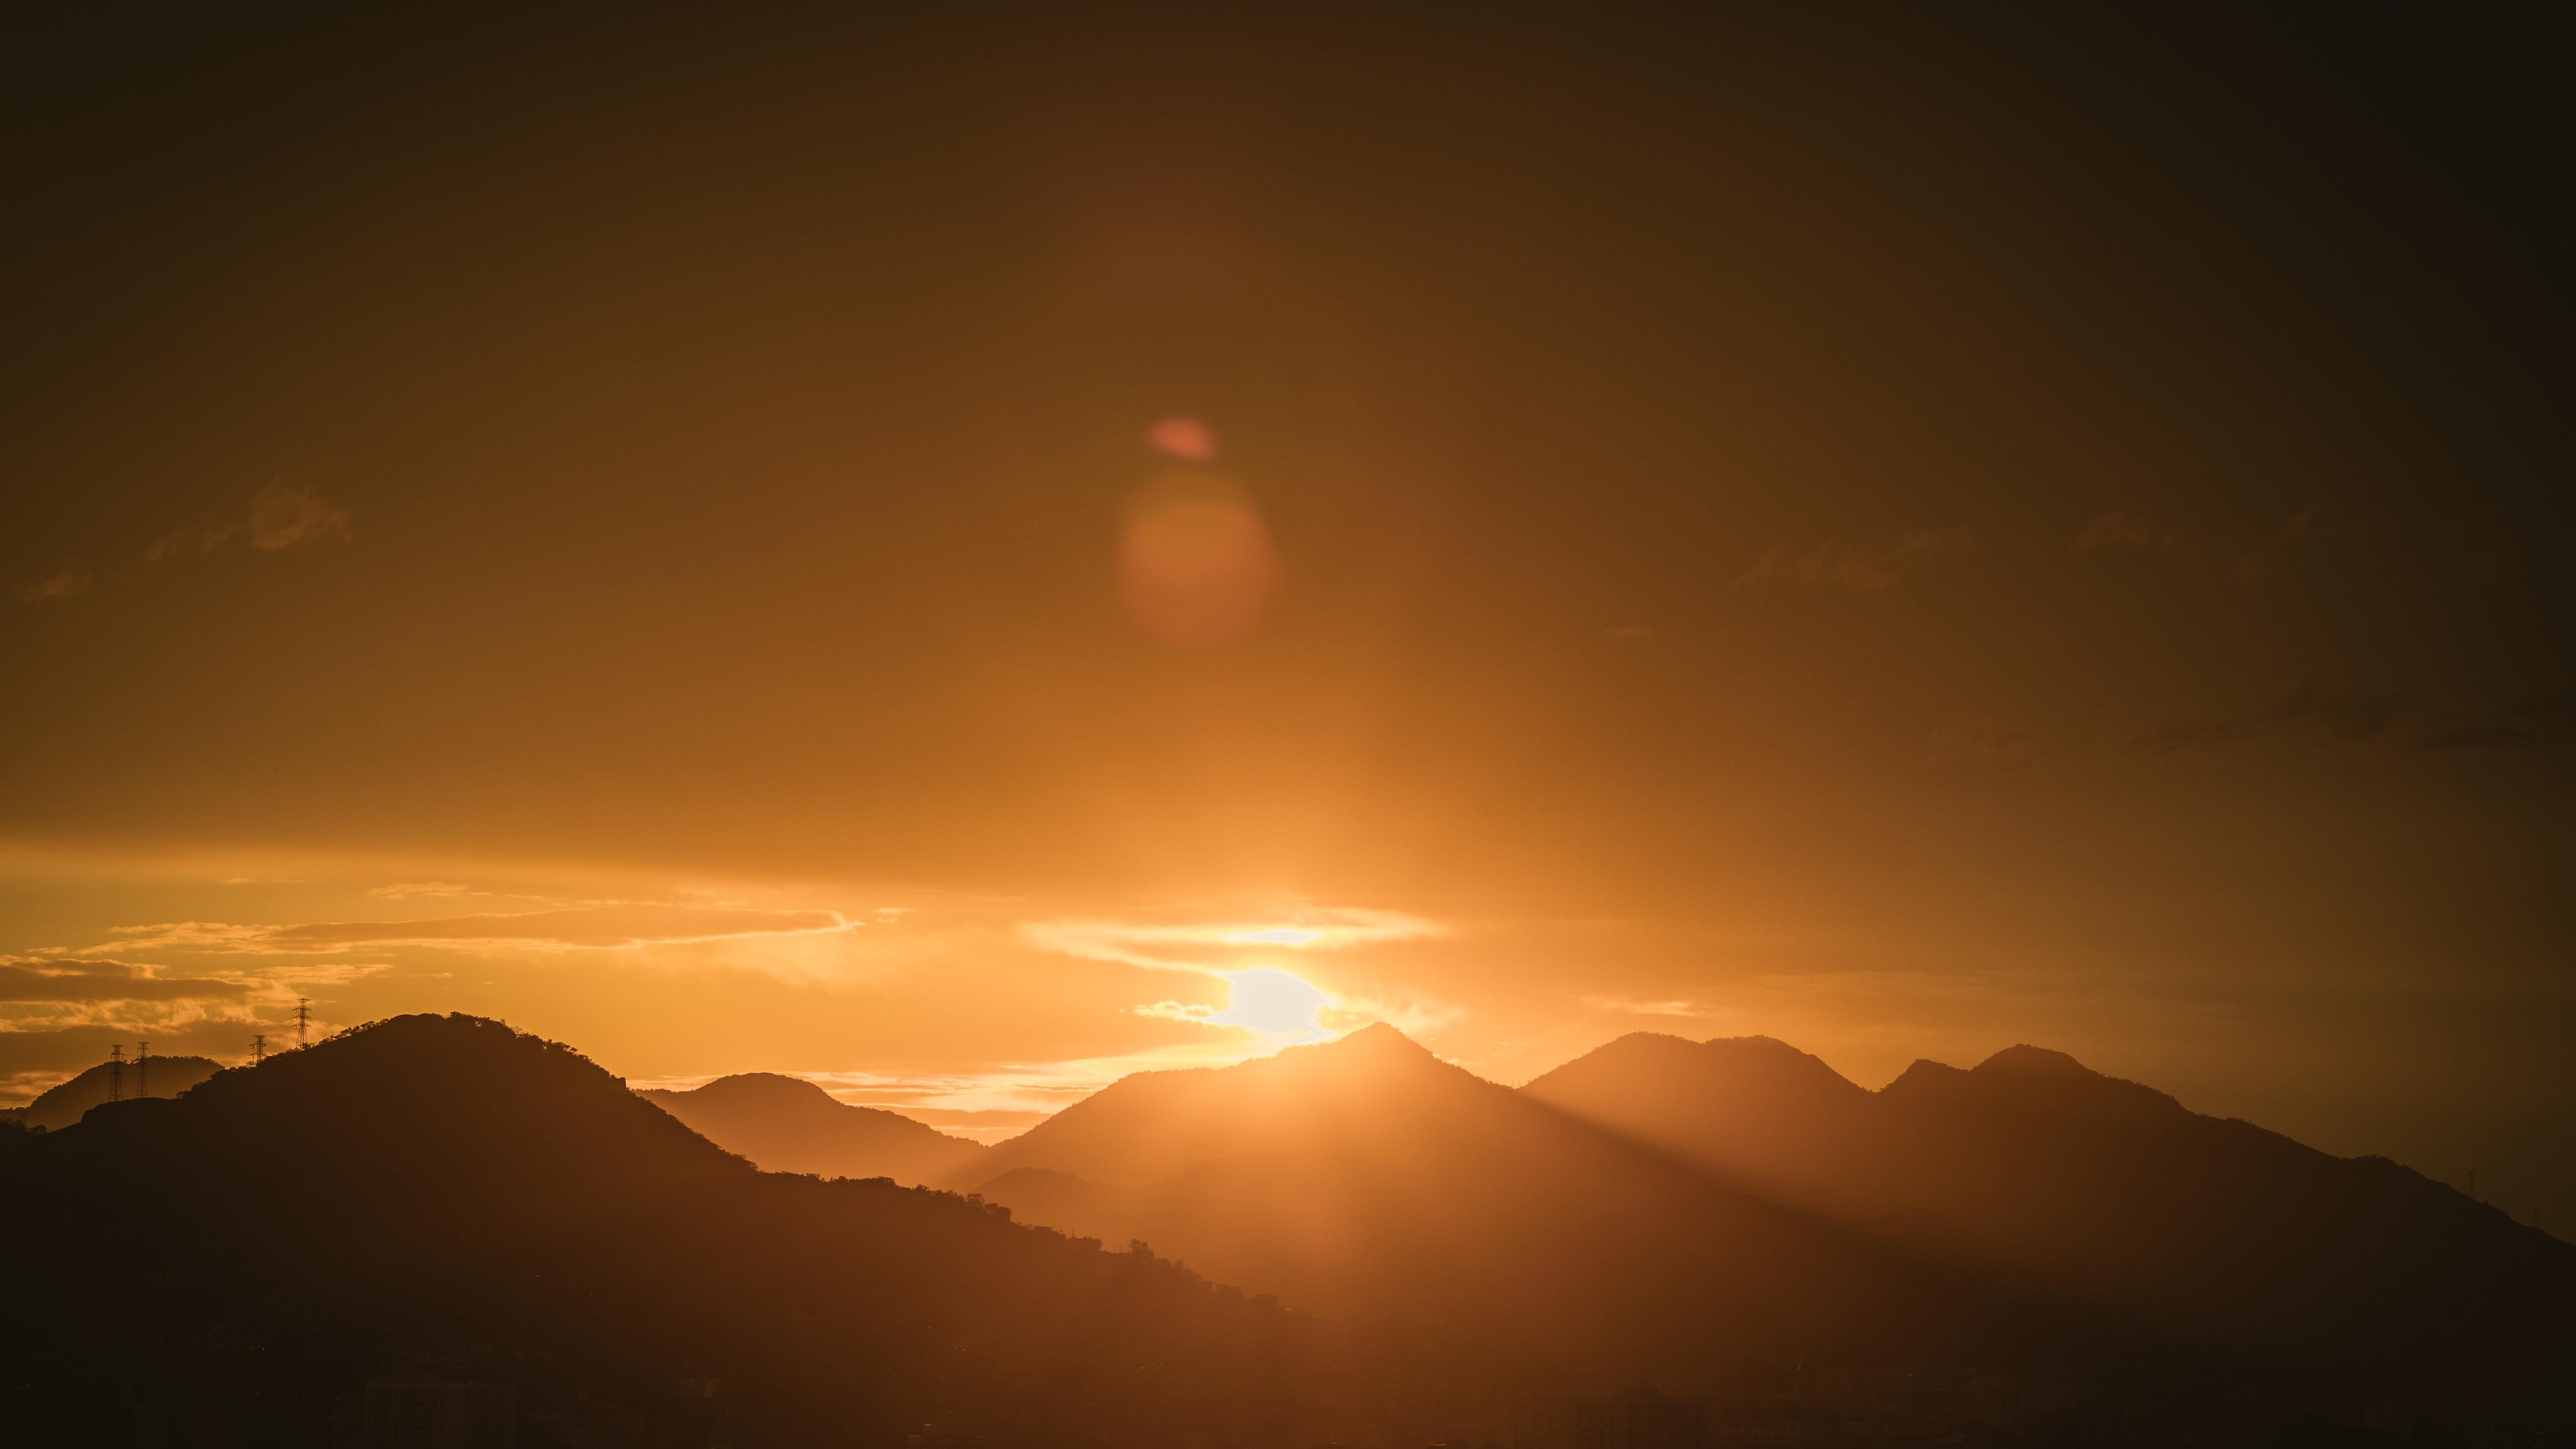 mountain range during golden hour 4k 1540135891 - Mountain Range During Golden Hour 4k - silhouette wallpapers, nature wallpapers, mountain wallpapers, hd-wallpapers, 5k wallpapers, 4k-wallpapers